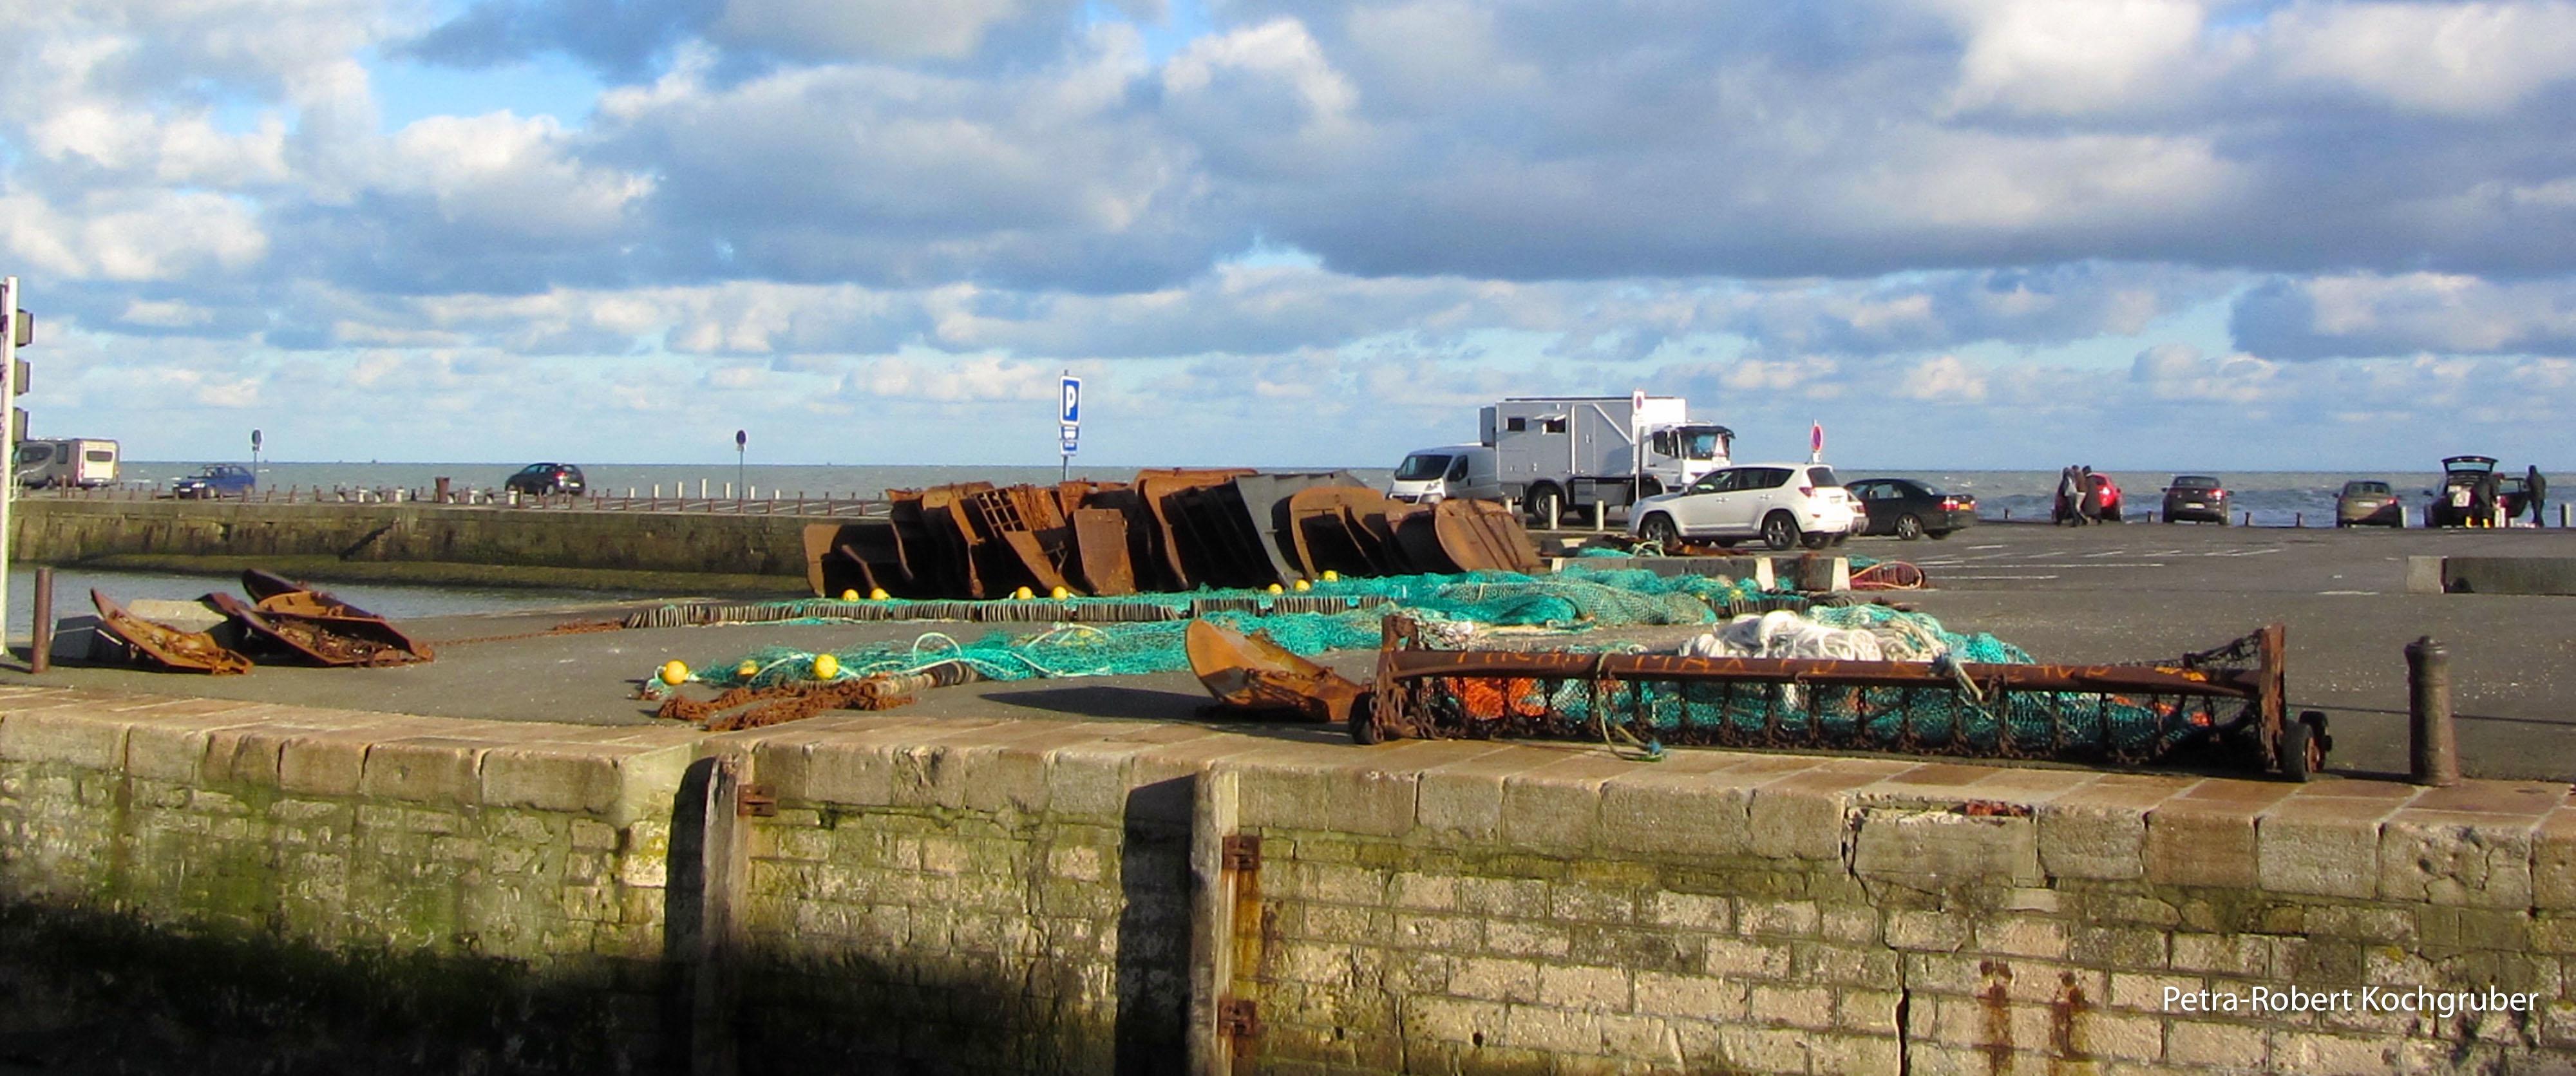 Port-en-Bessin-Fischerhafen-wohnmobil-in-der-normandie